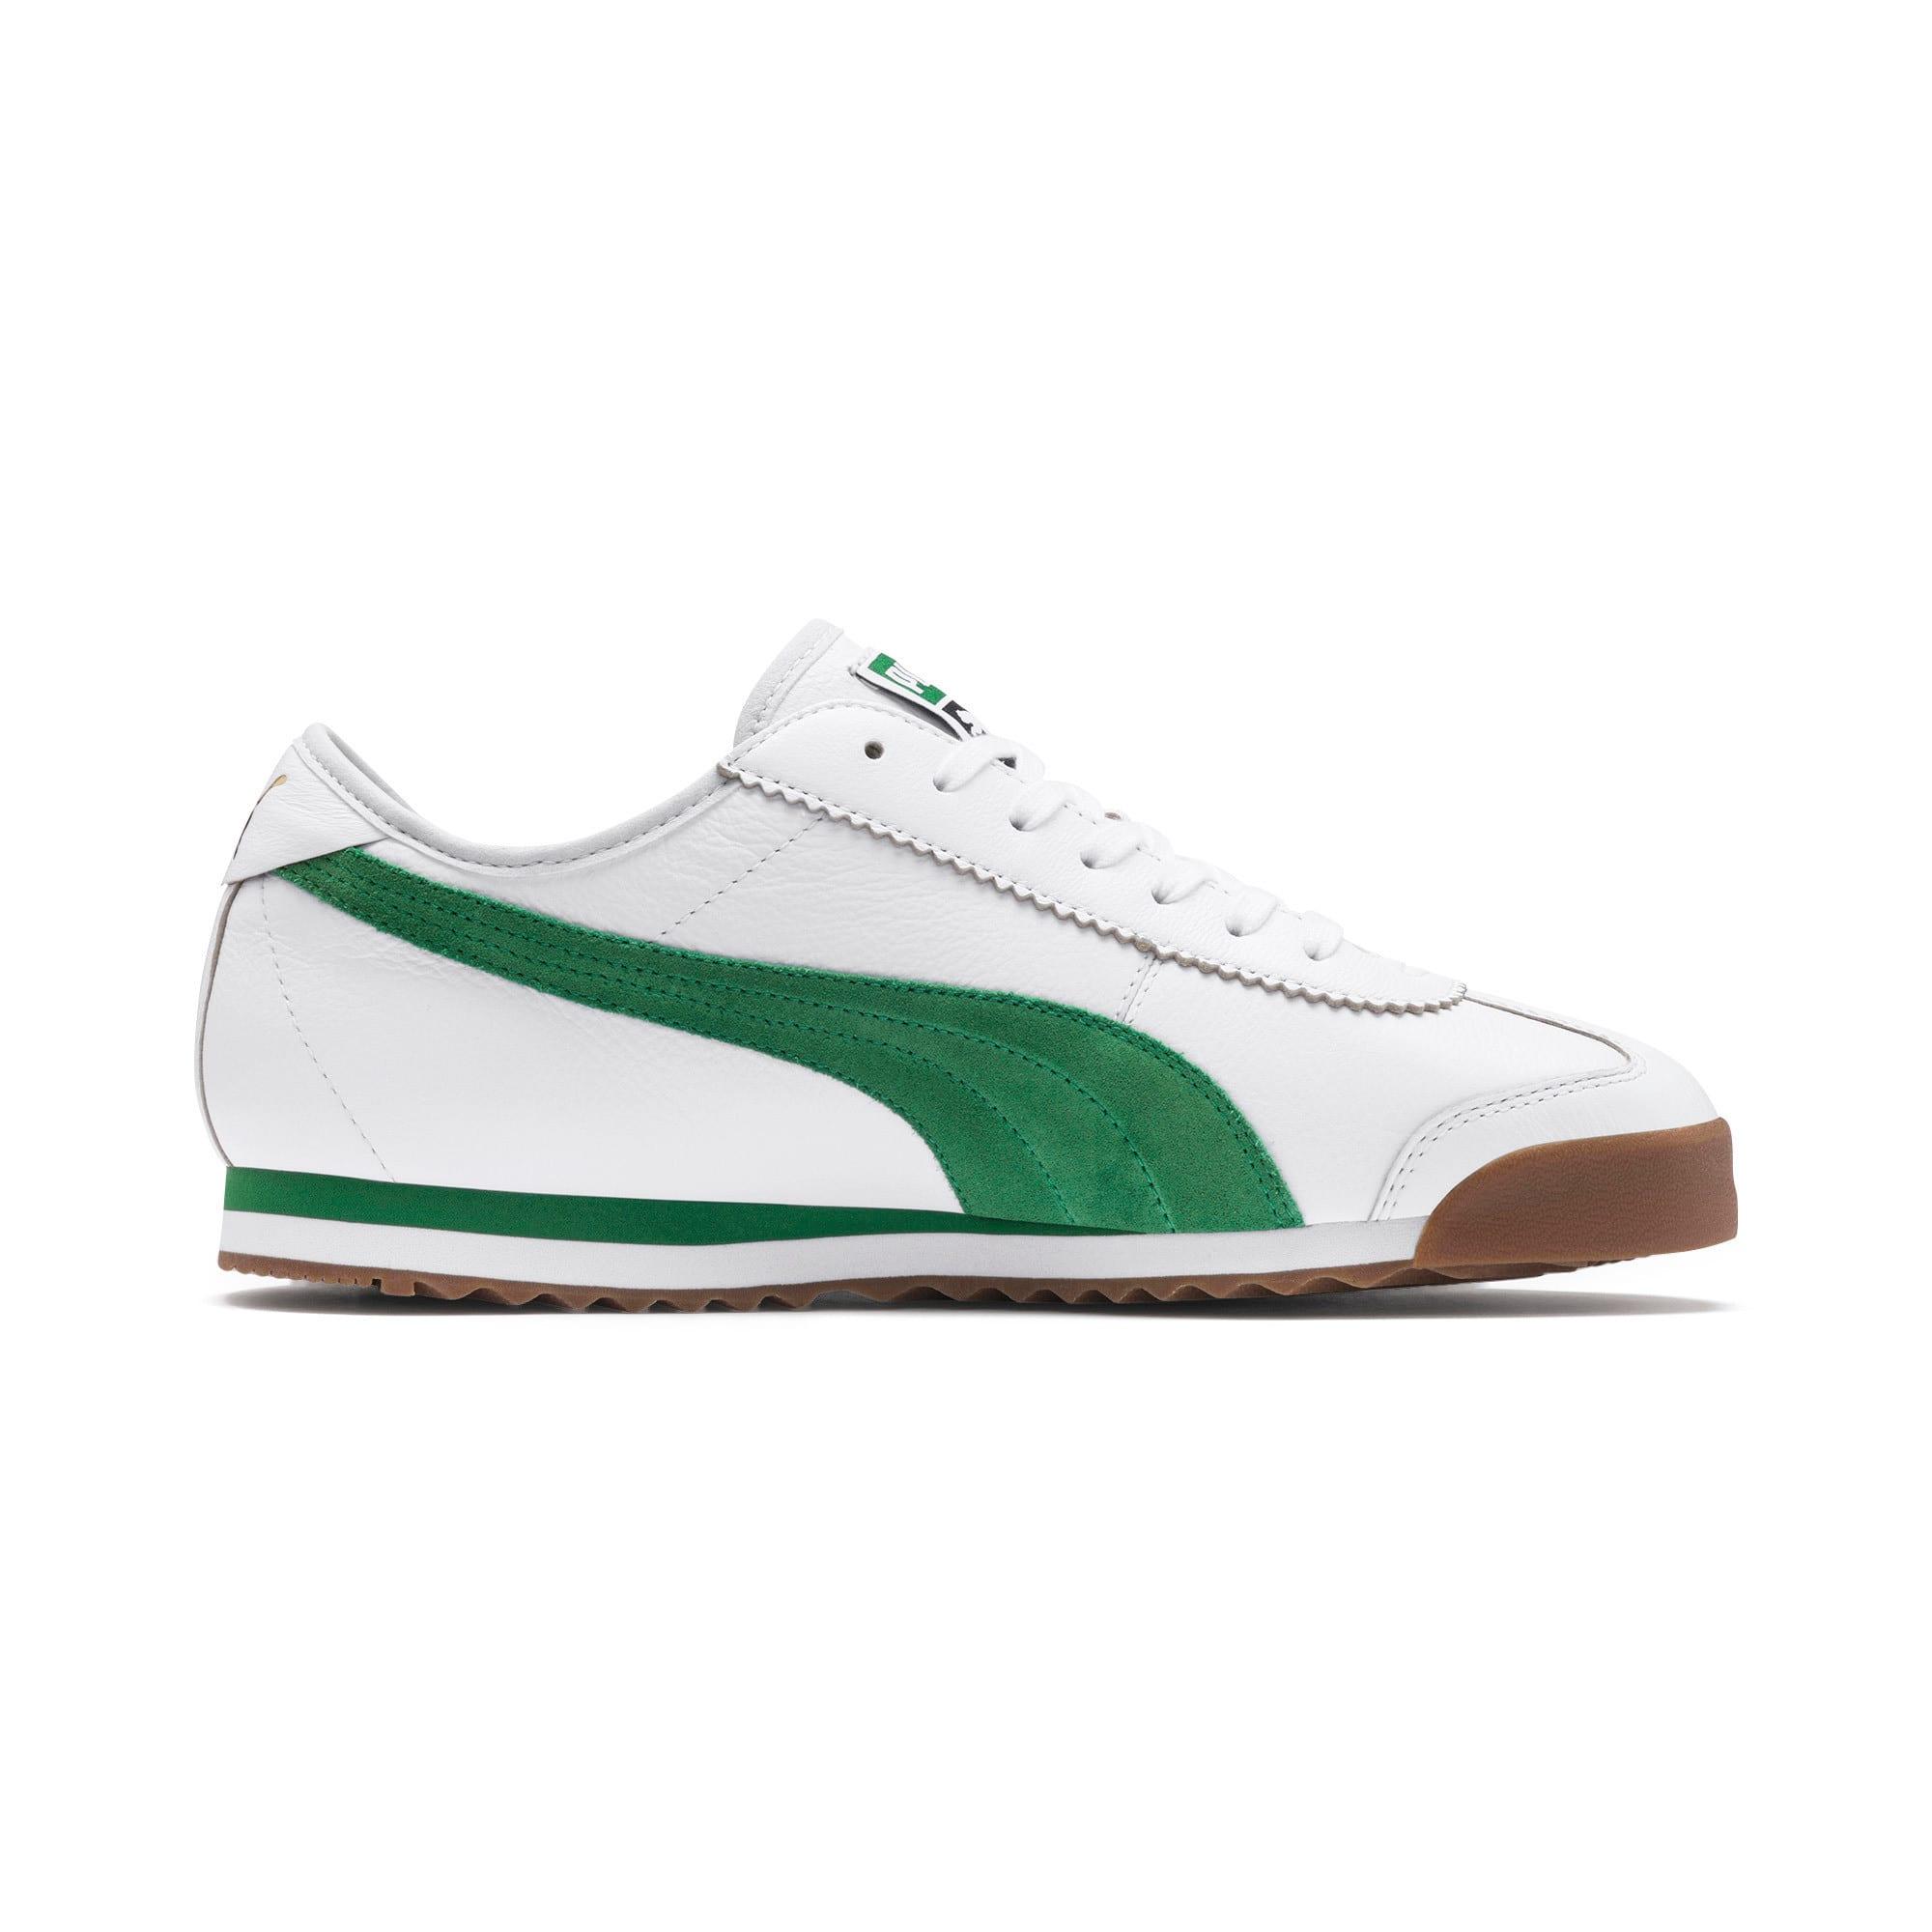 Thumbnail 6 of ローマ '68 OG スニーカー, Puma White-Amazon Green, medium-JPN